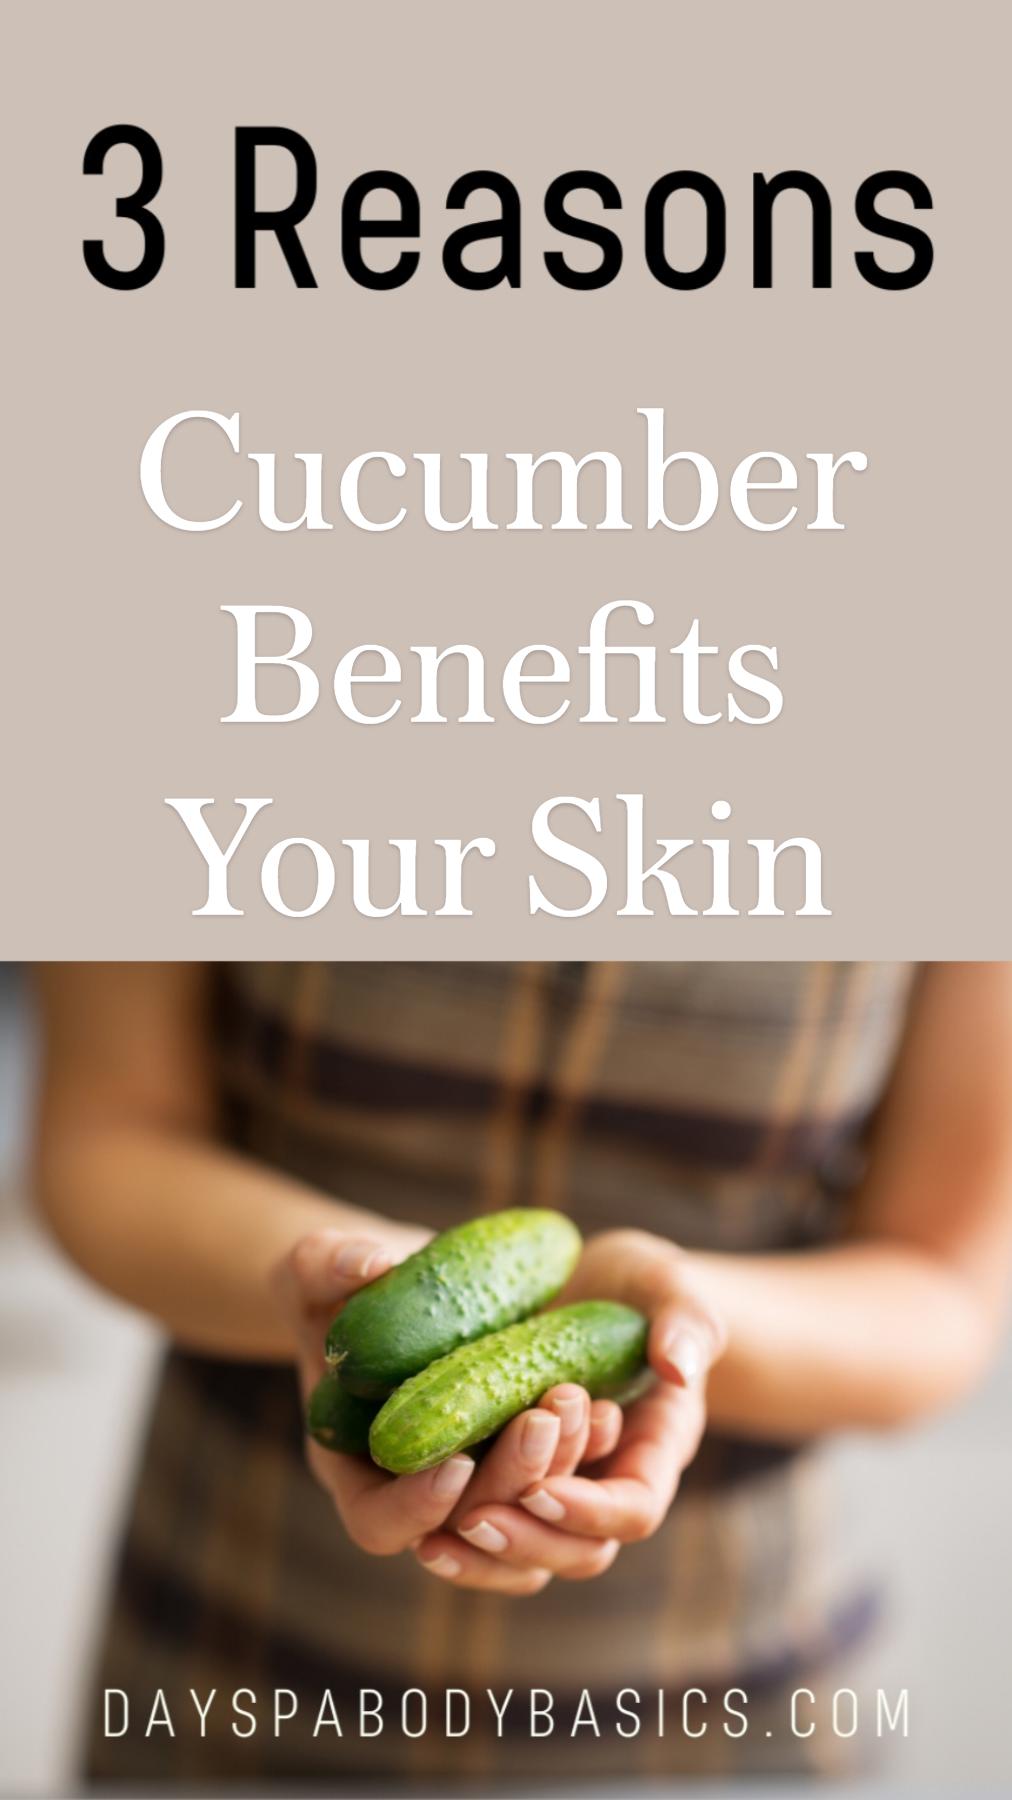 Cucumber Benefits Your Skin